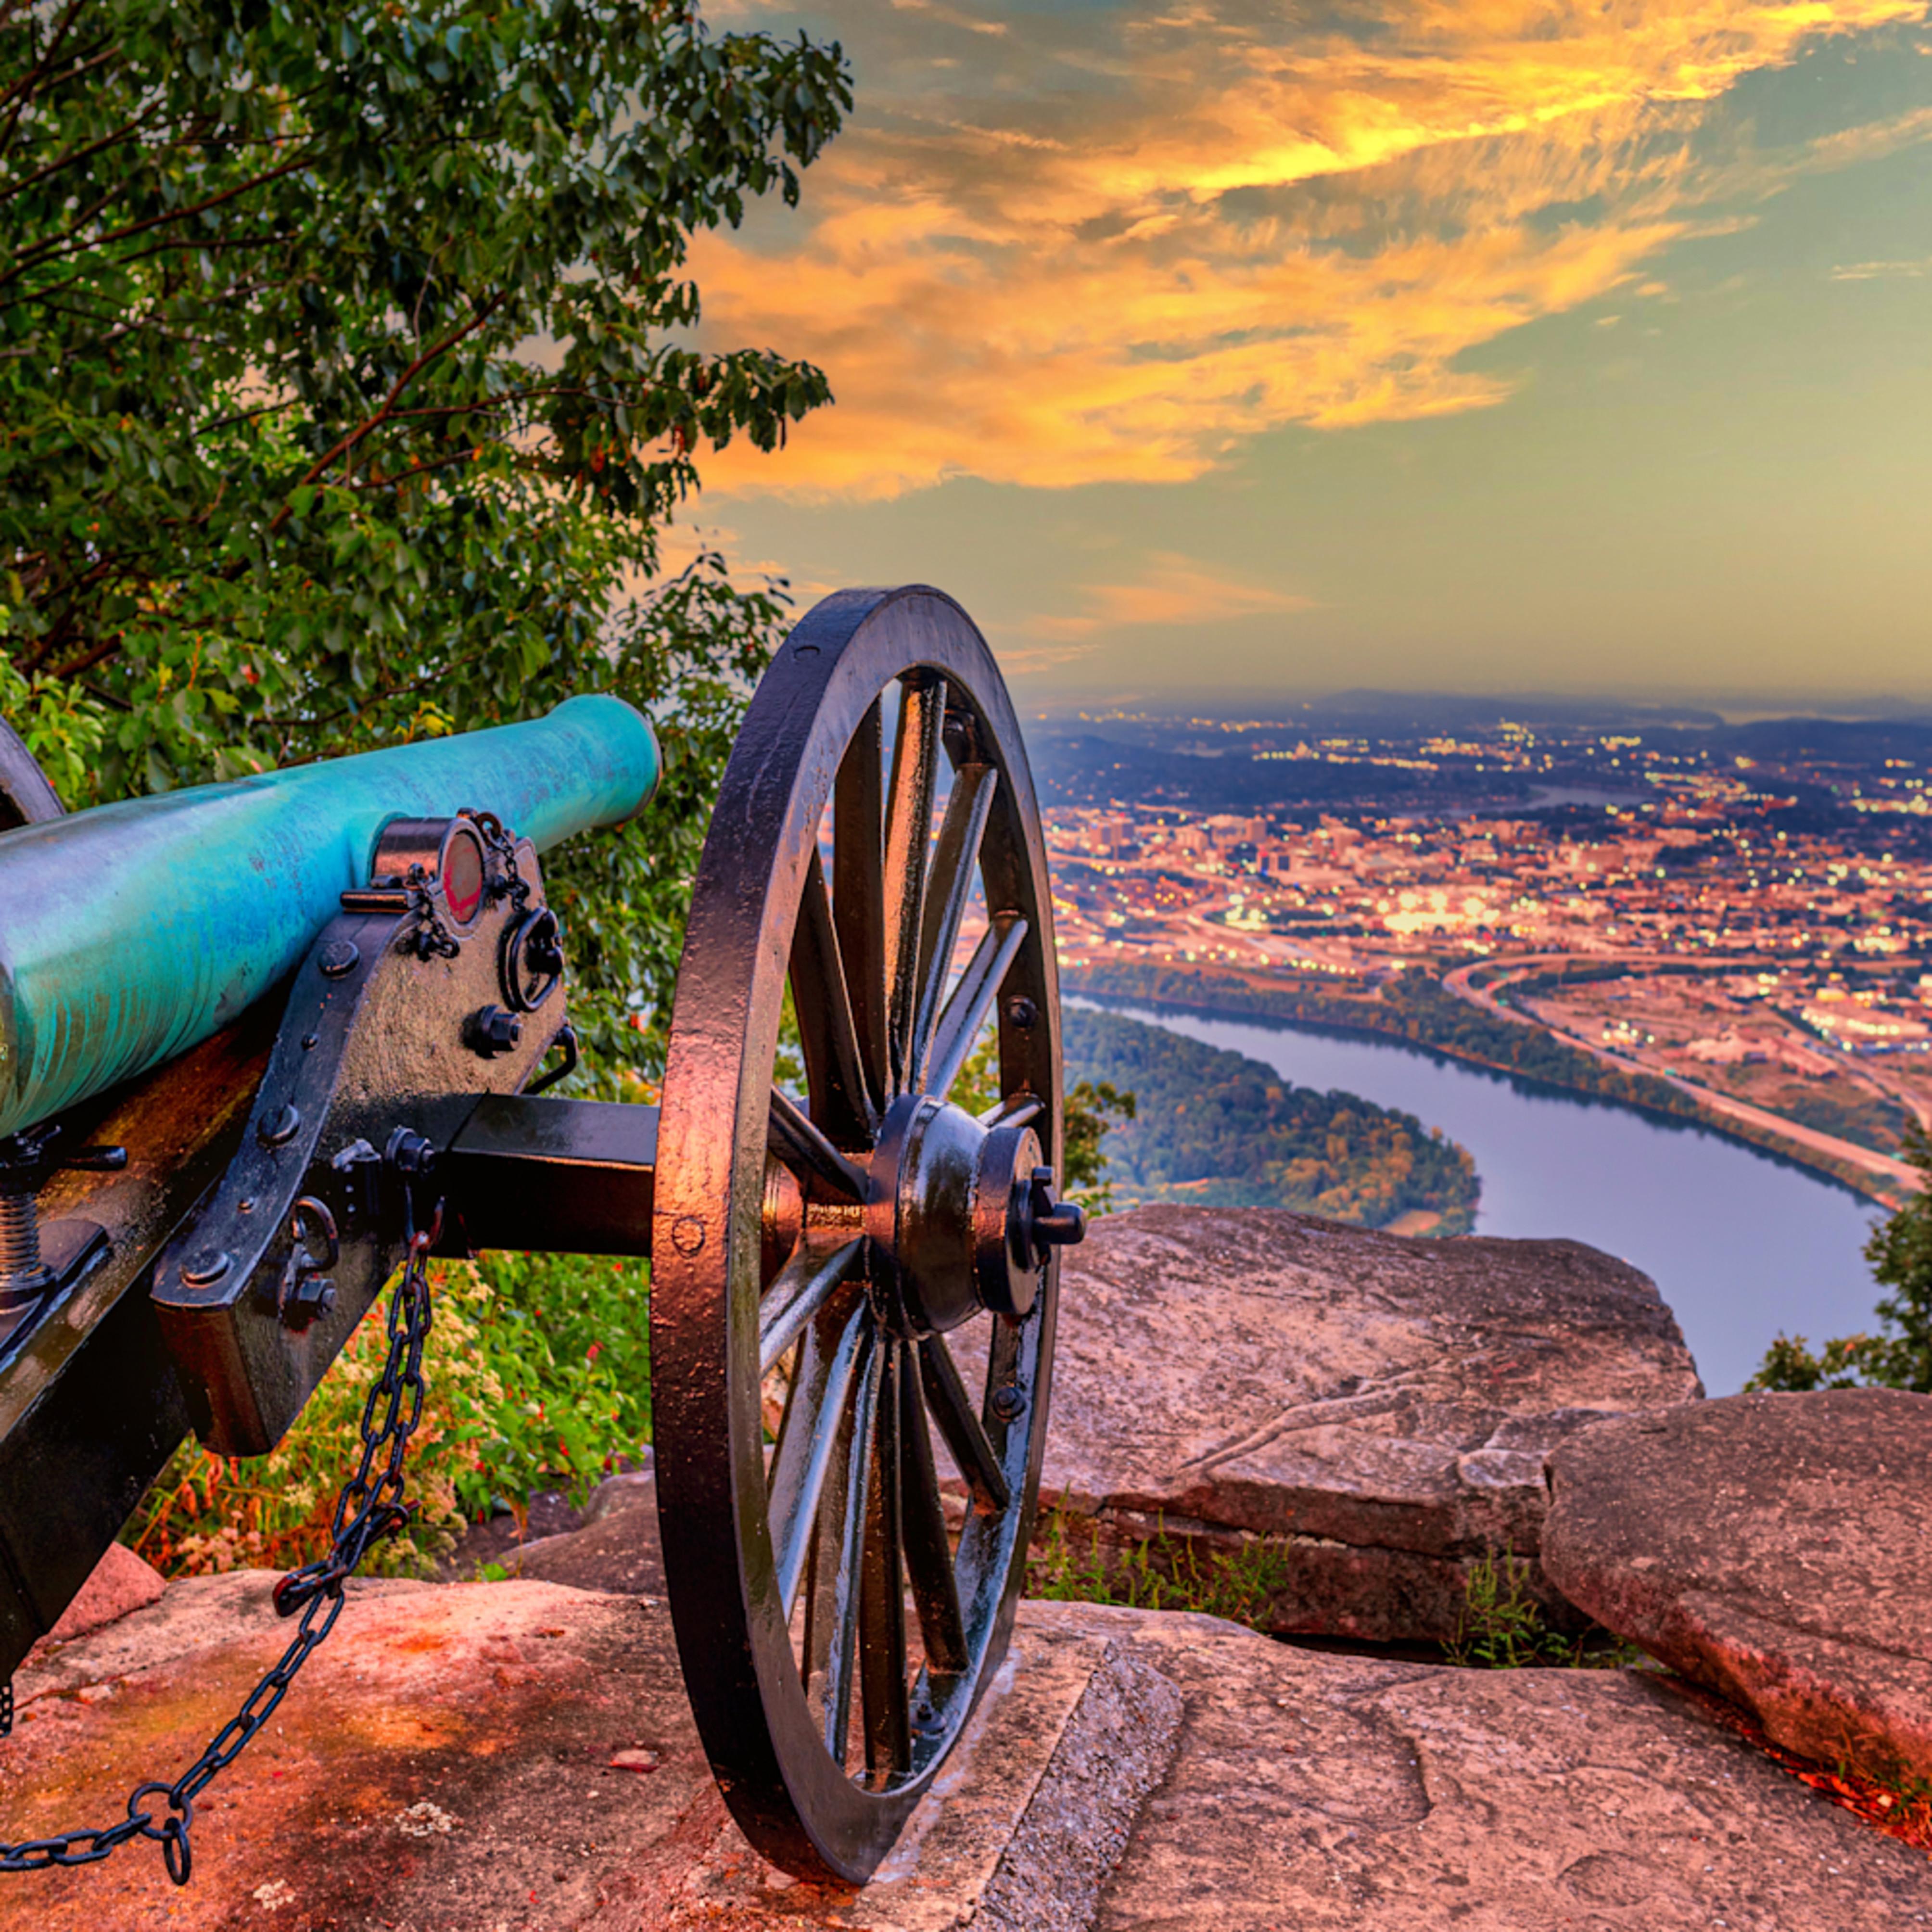 Cannon b6xfmz